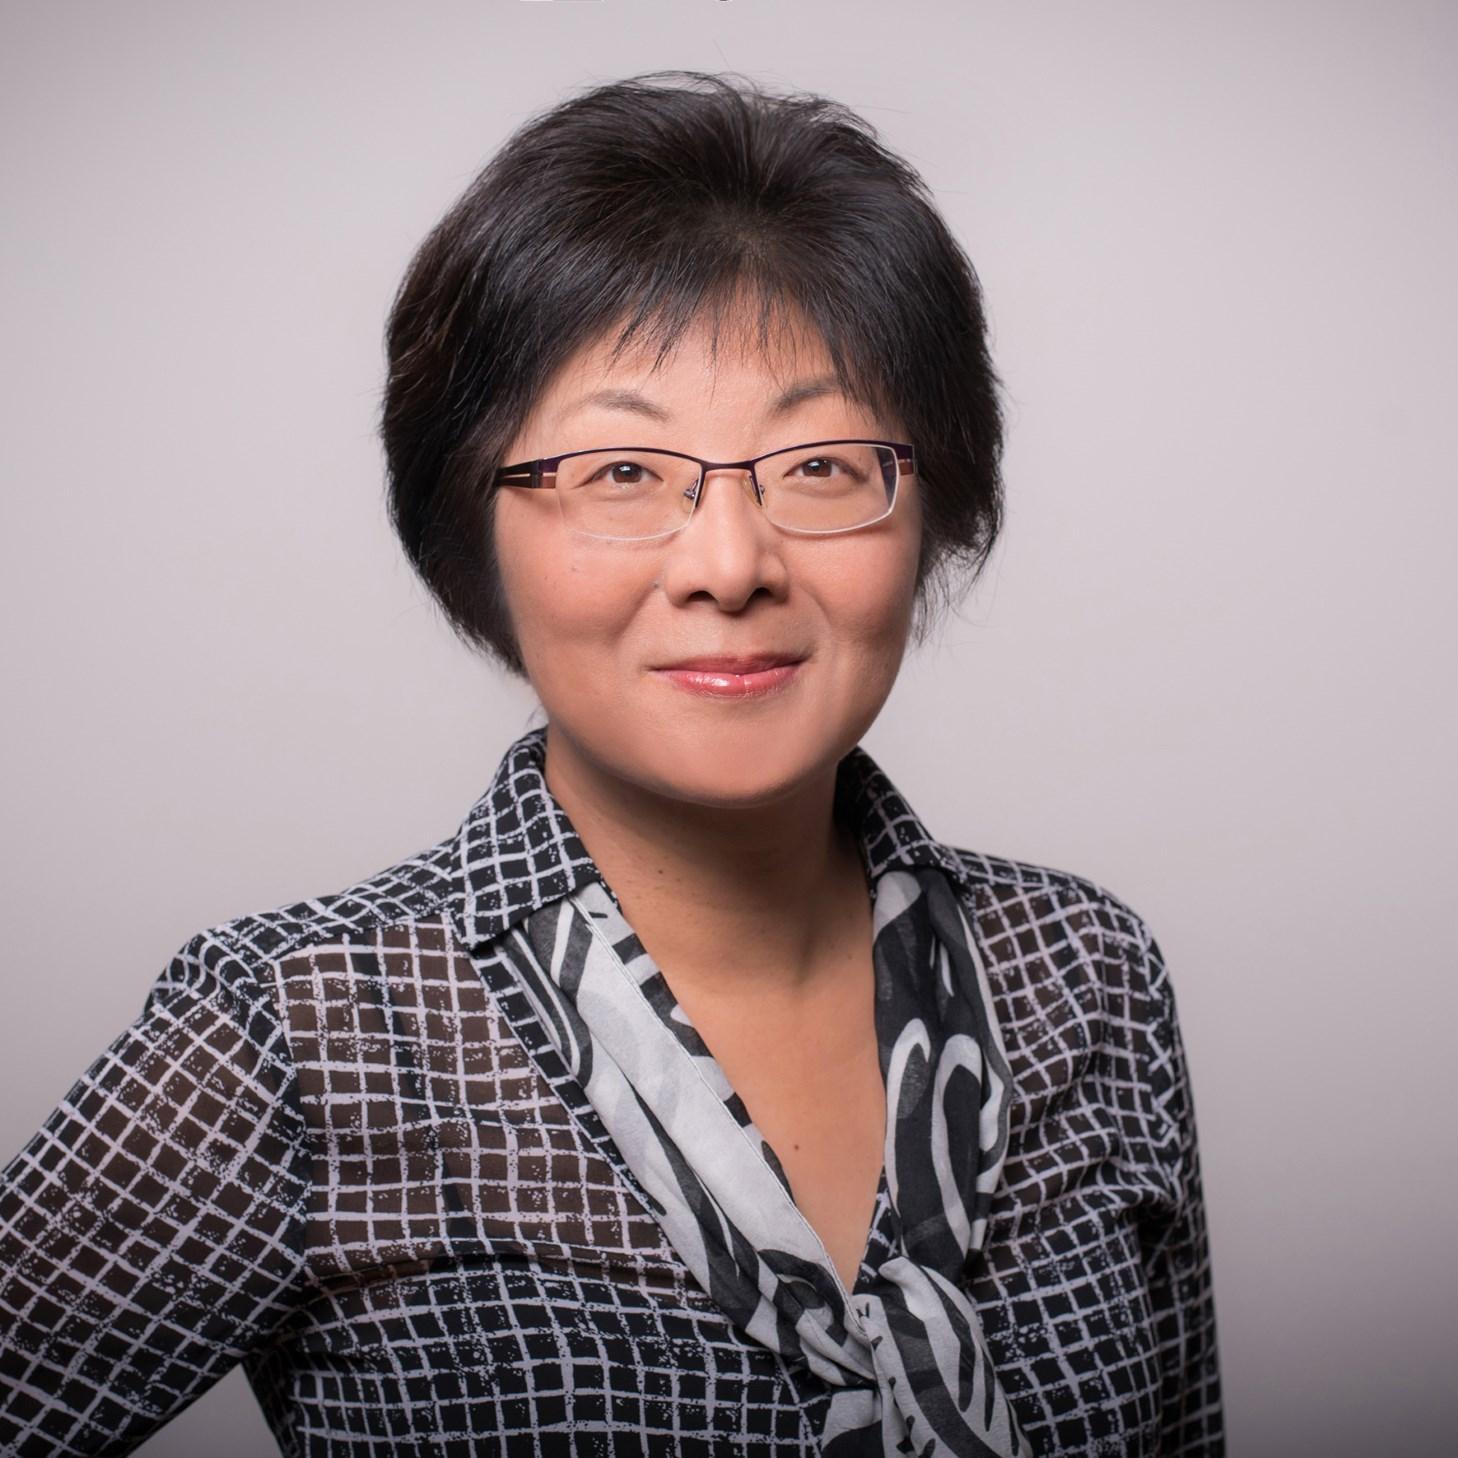 Shu-Chen Li